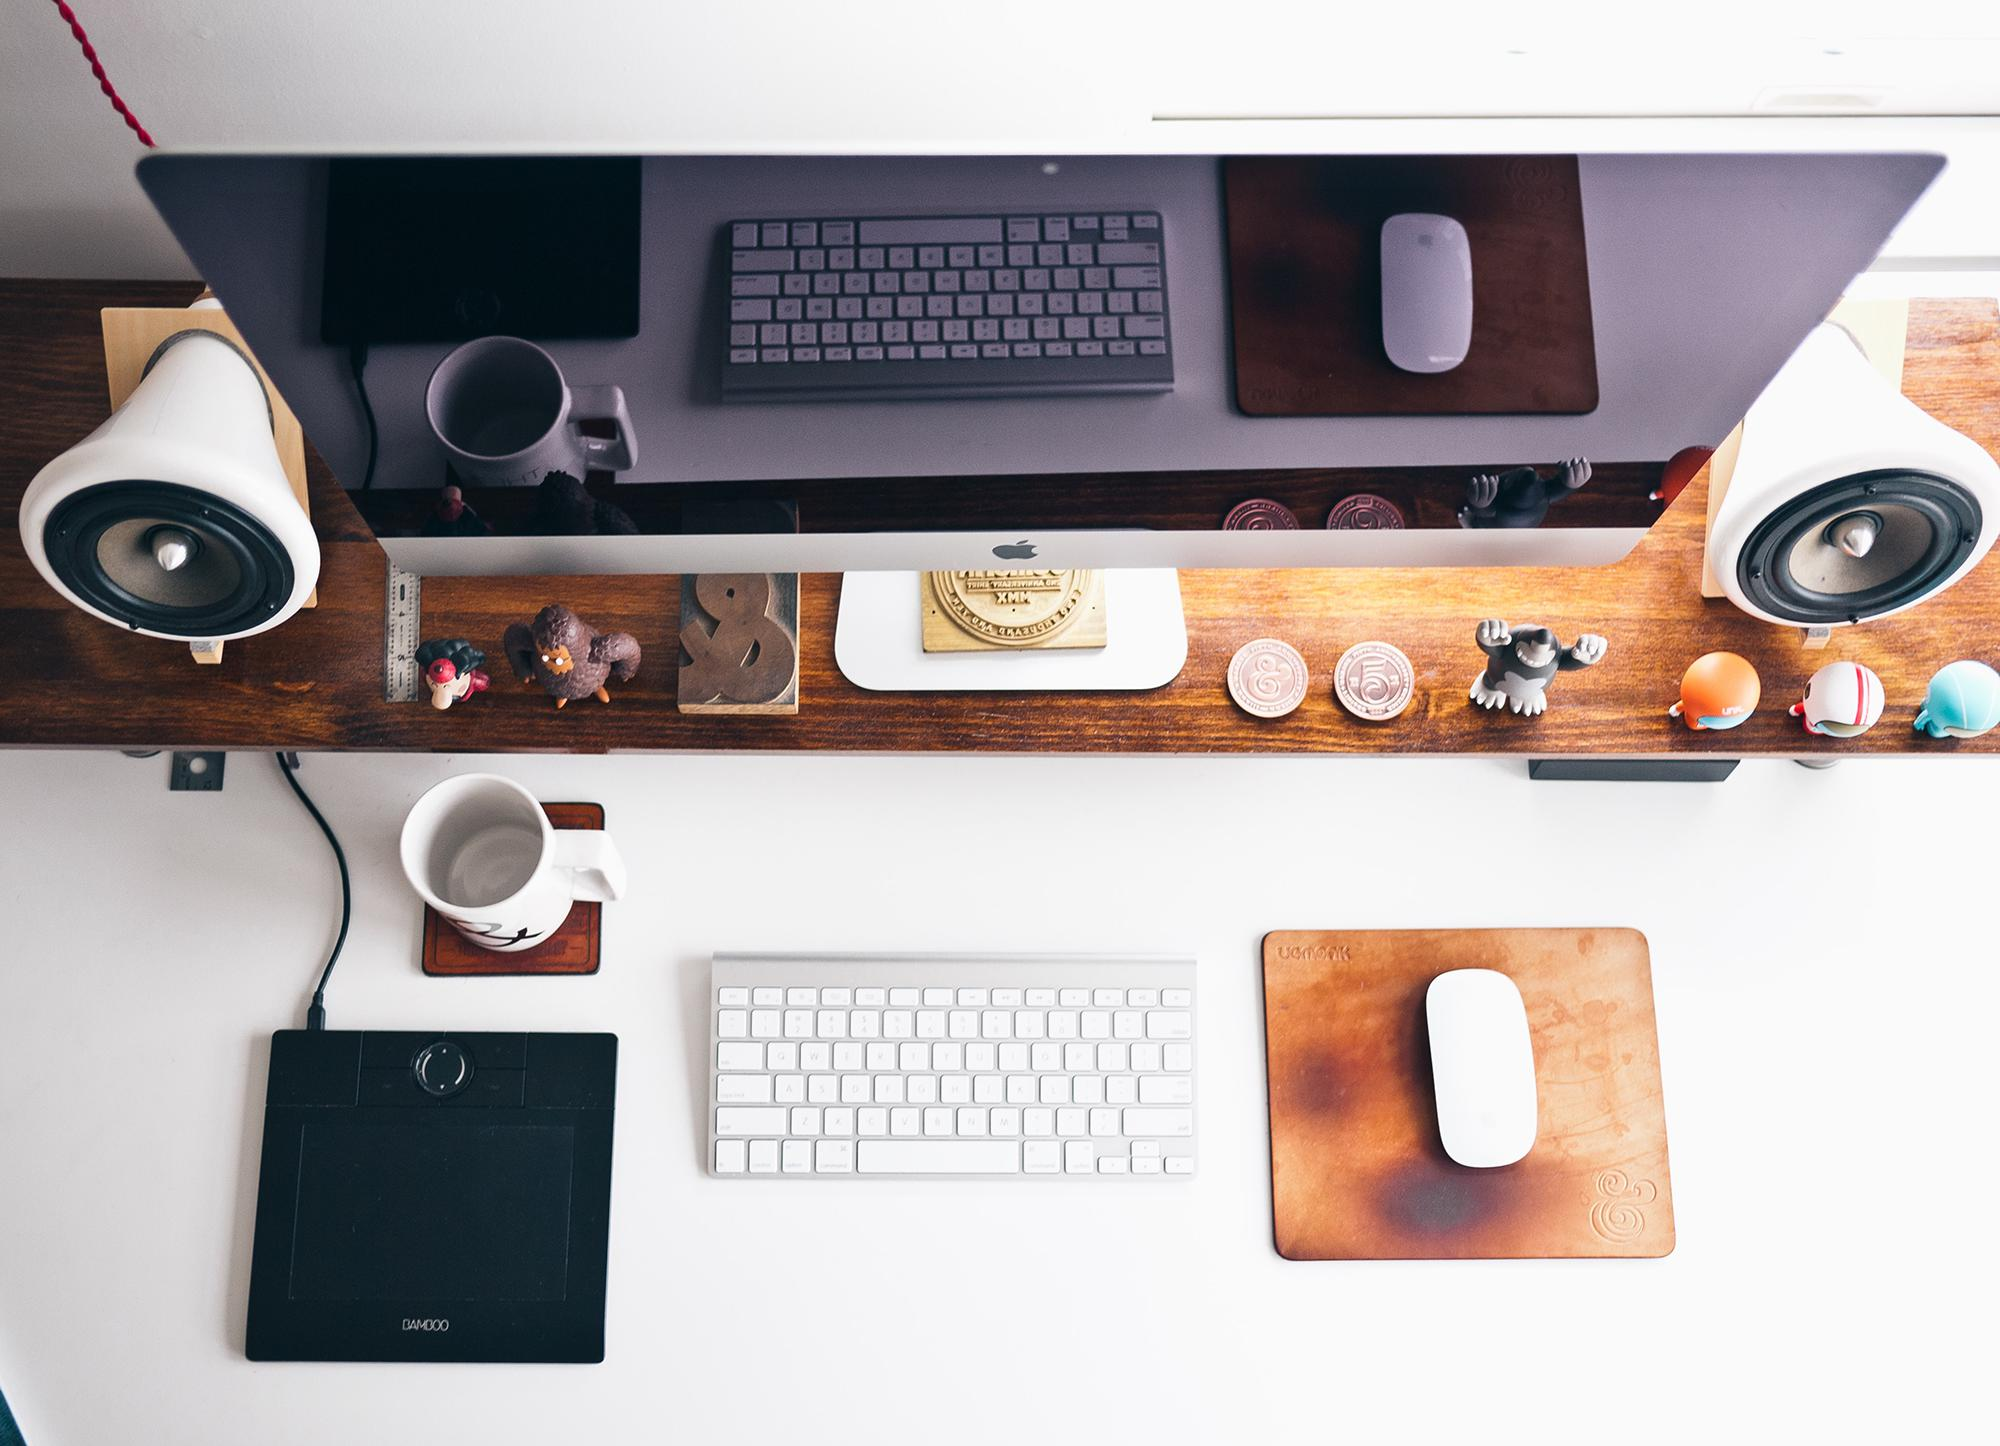 Graphic Design Desk arrangement with Apple computer